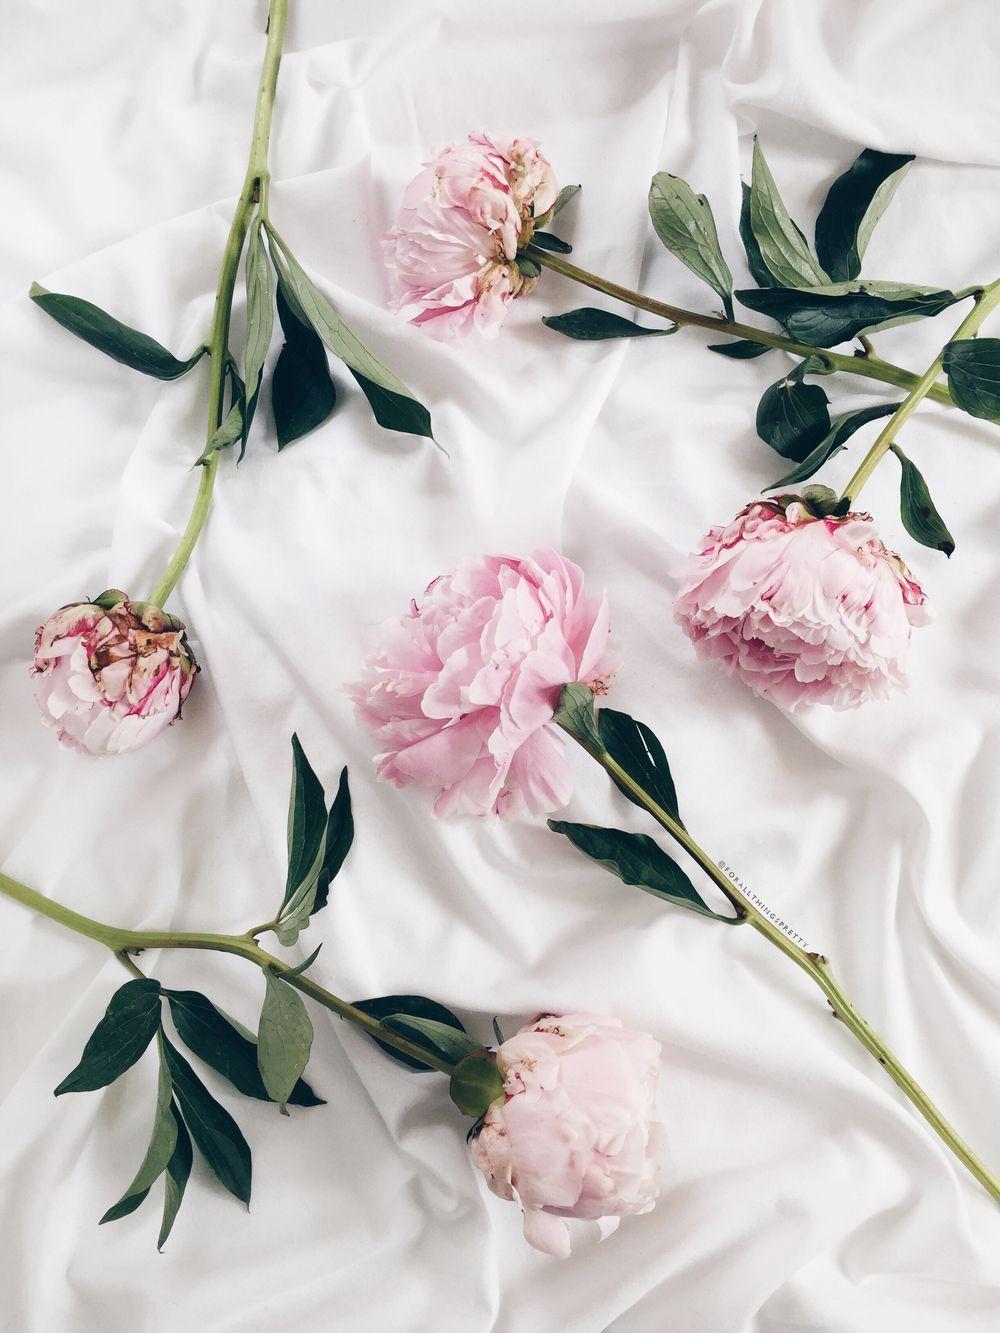 Dress Up Your Tech Peony Wallpaper Peony Wallpaper Flower Wallpaper Ipad Wallpaper Cute flower wallpaper for ipad